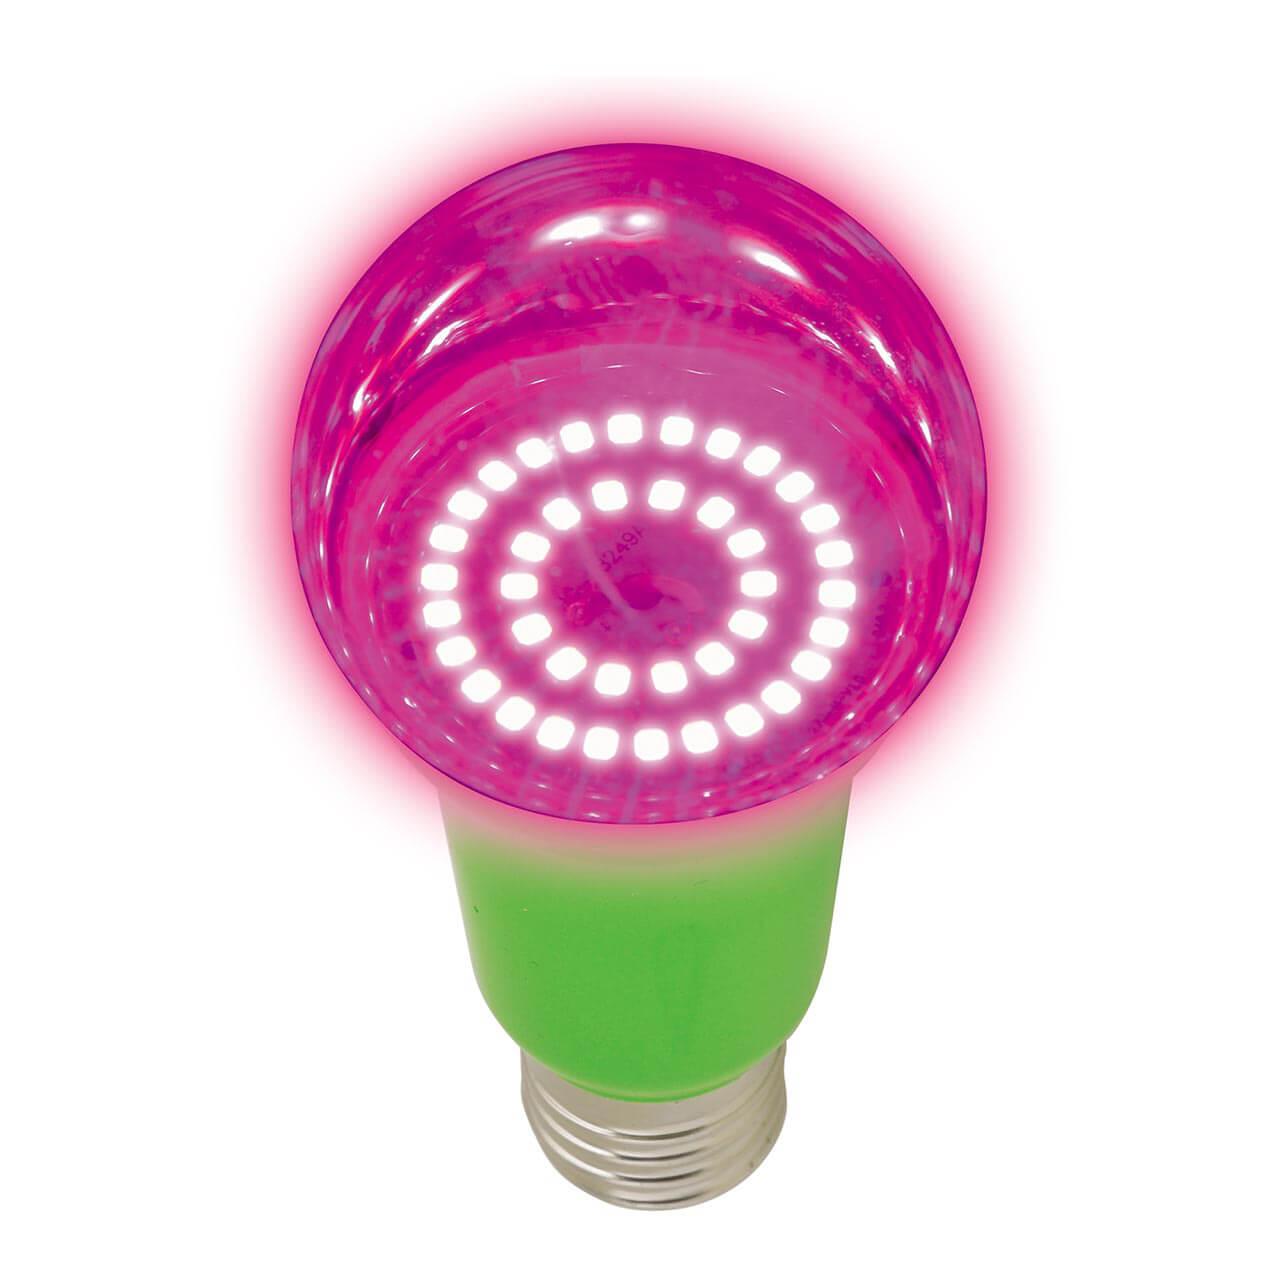 Лампочка Uniel LED-A60-8W/SPSB/E27/CL PLP30GR Для растений A лампочка uniel led a60 8w ww e27 cl sky